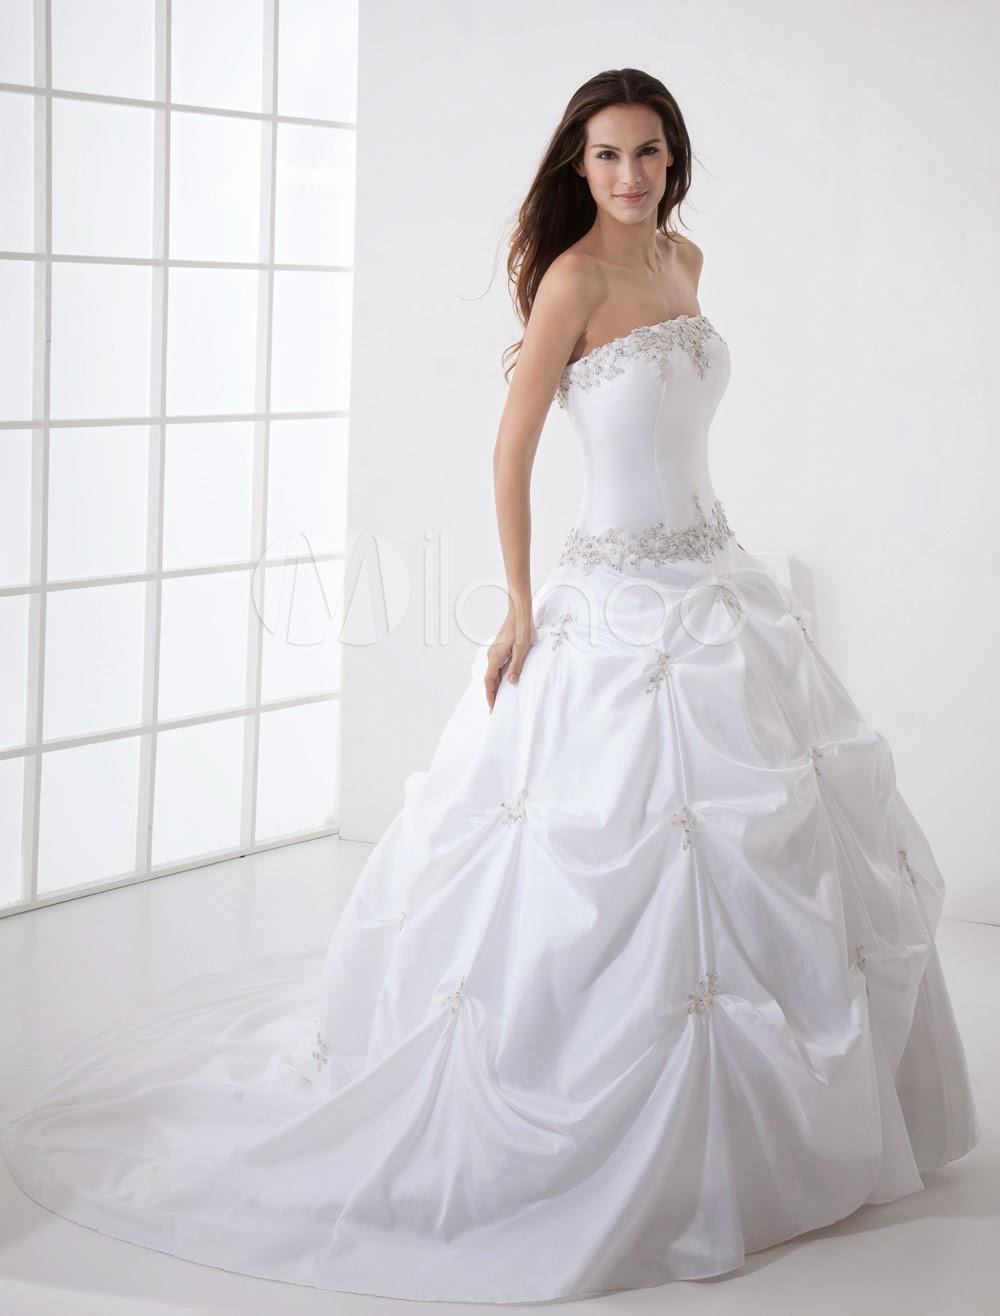 China Wholesale Dresses - Ball Gown Strapless Beading Taffeta Wedding Dress